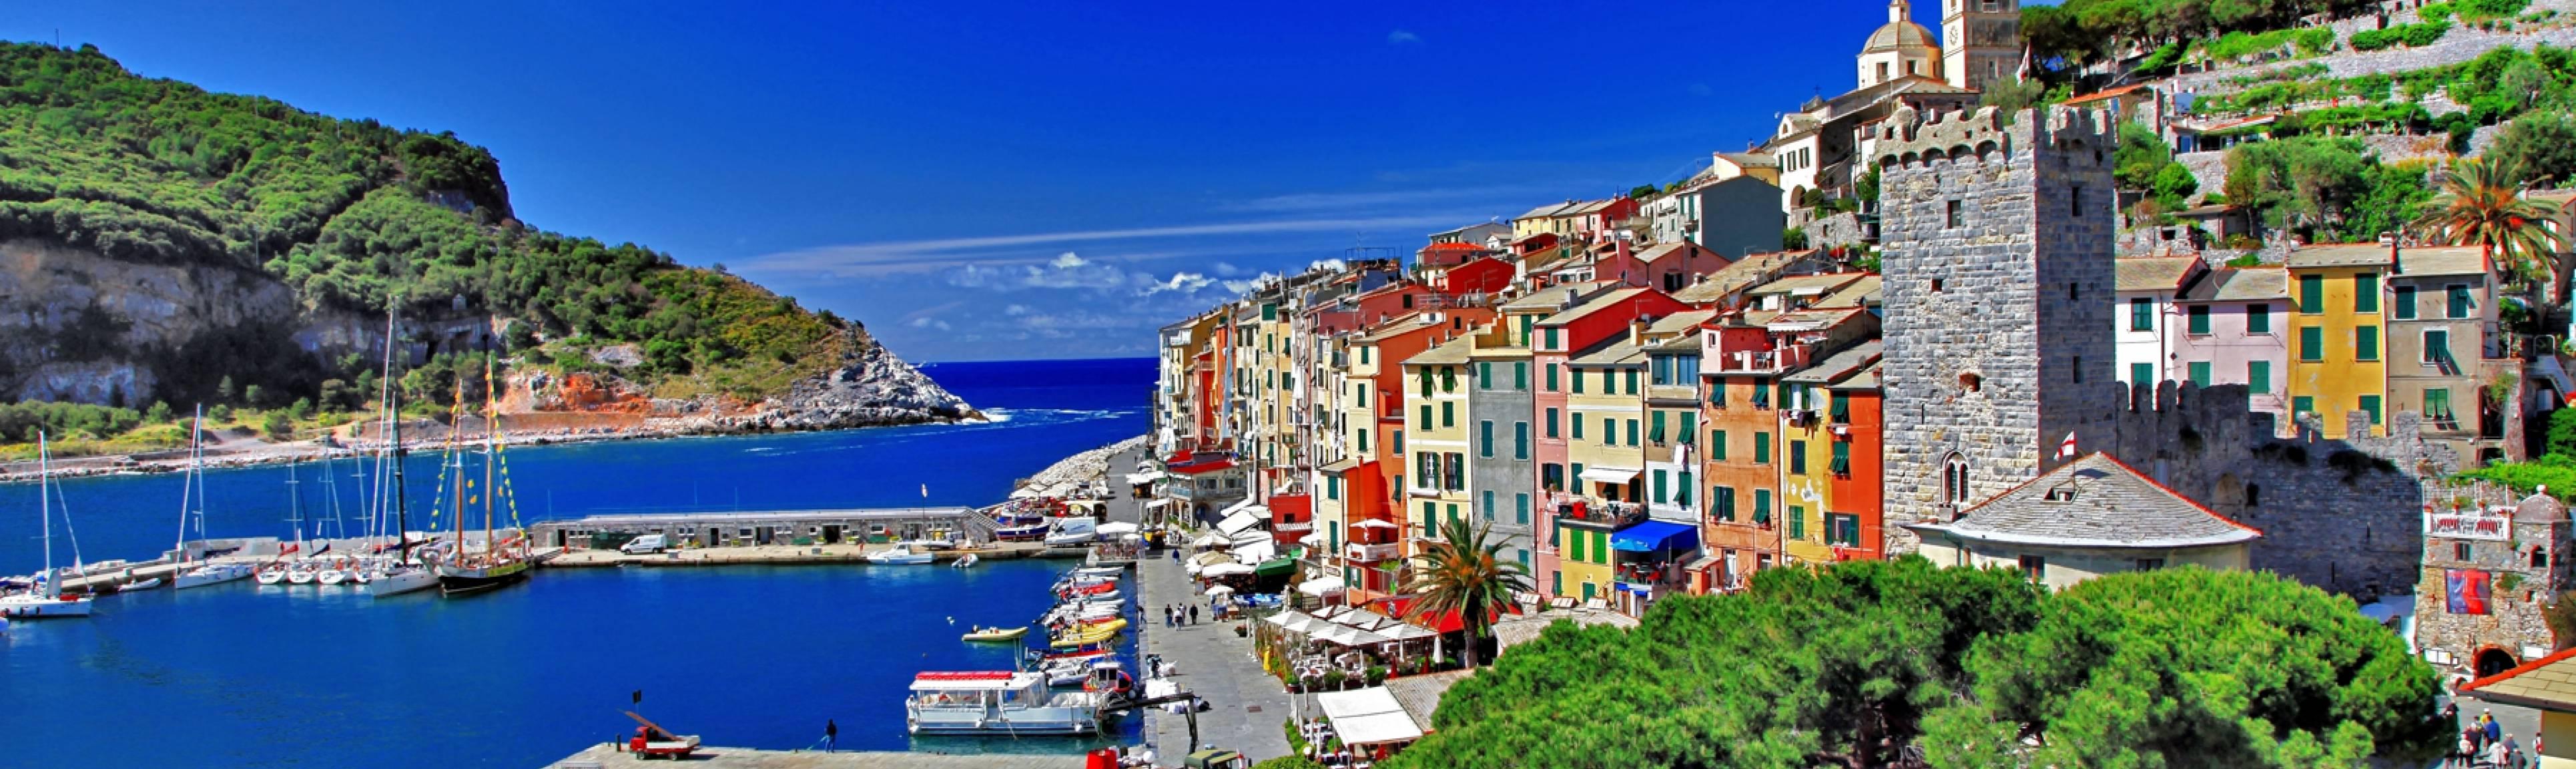 Port of Portovenere alongside the blue waters of the Liigurian coast